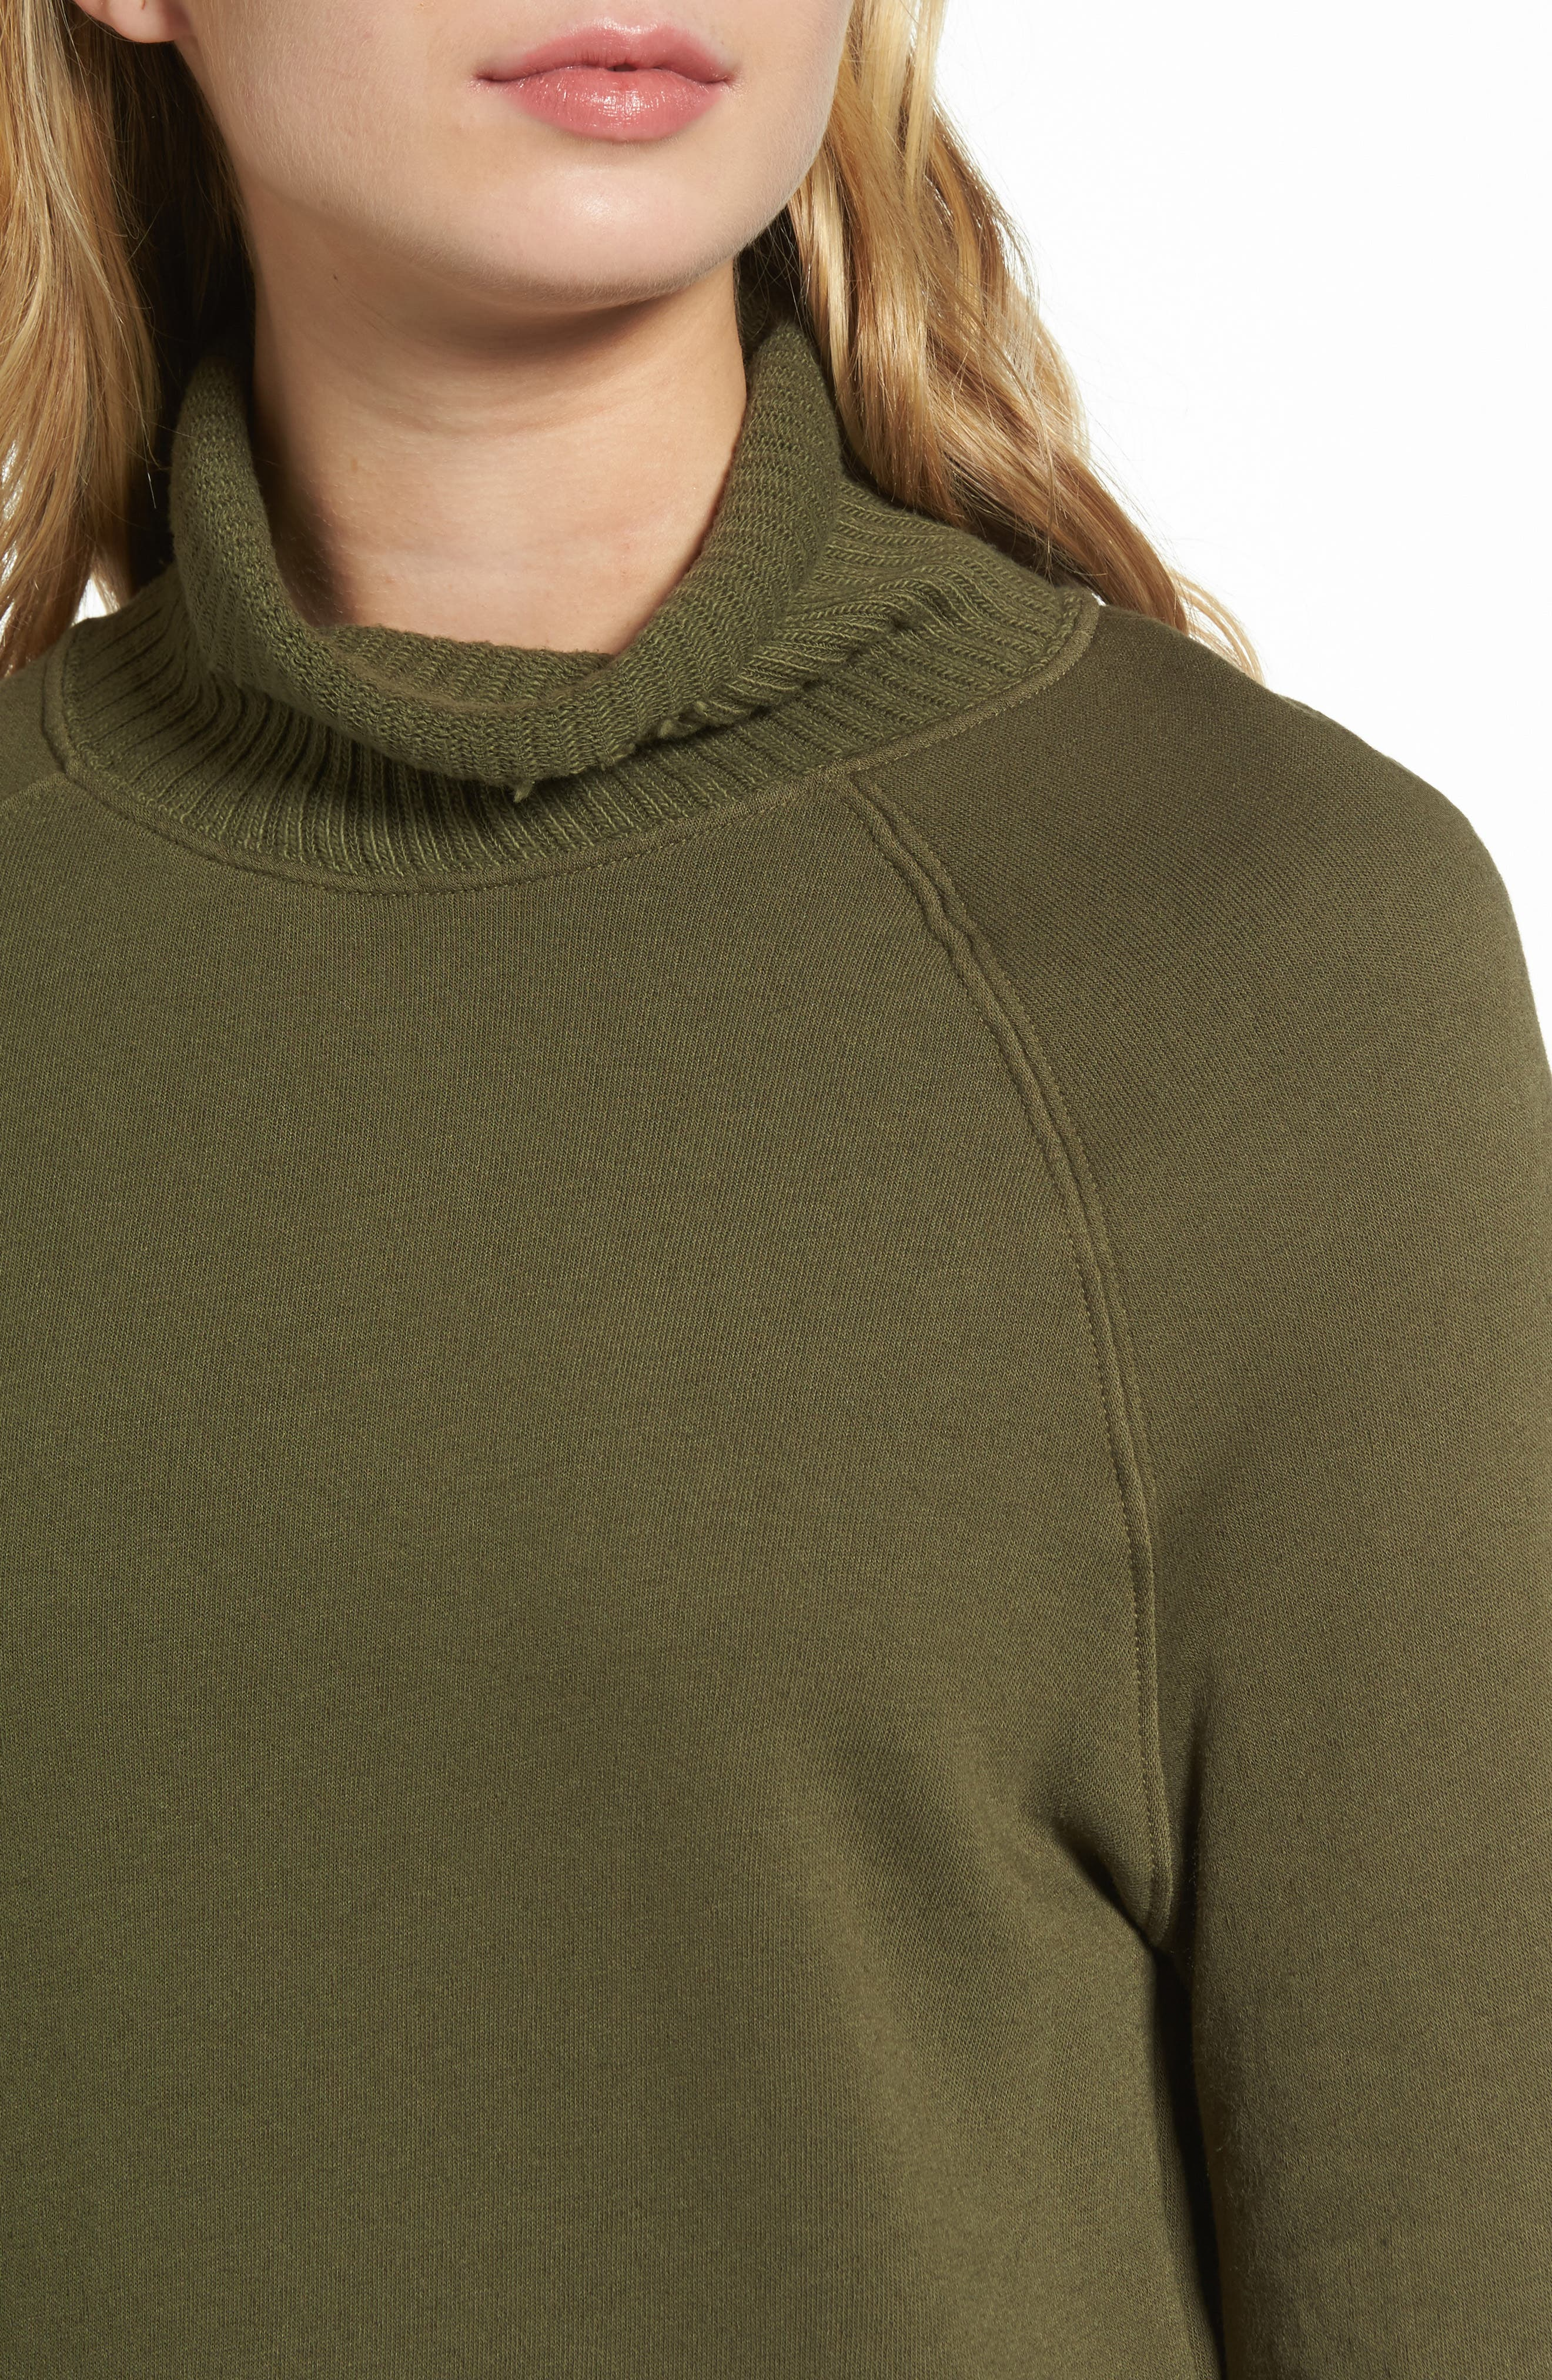 Distressed Fleece Turtleneck Sweatshirt,                             Alternate thumbnail 4, color,                             317